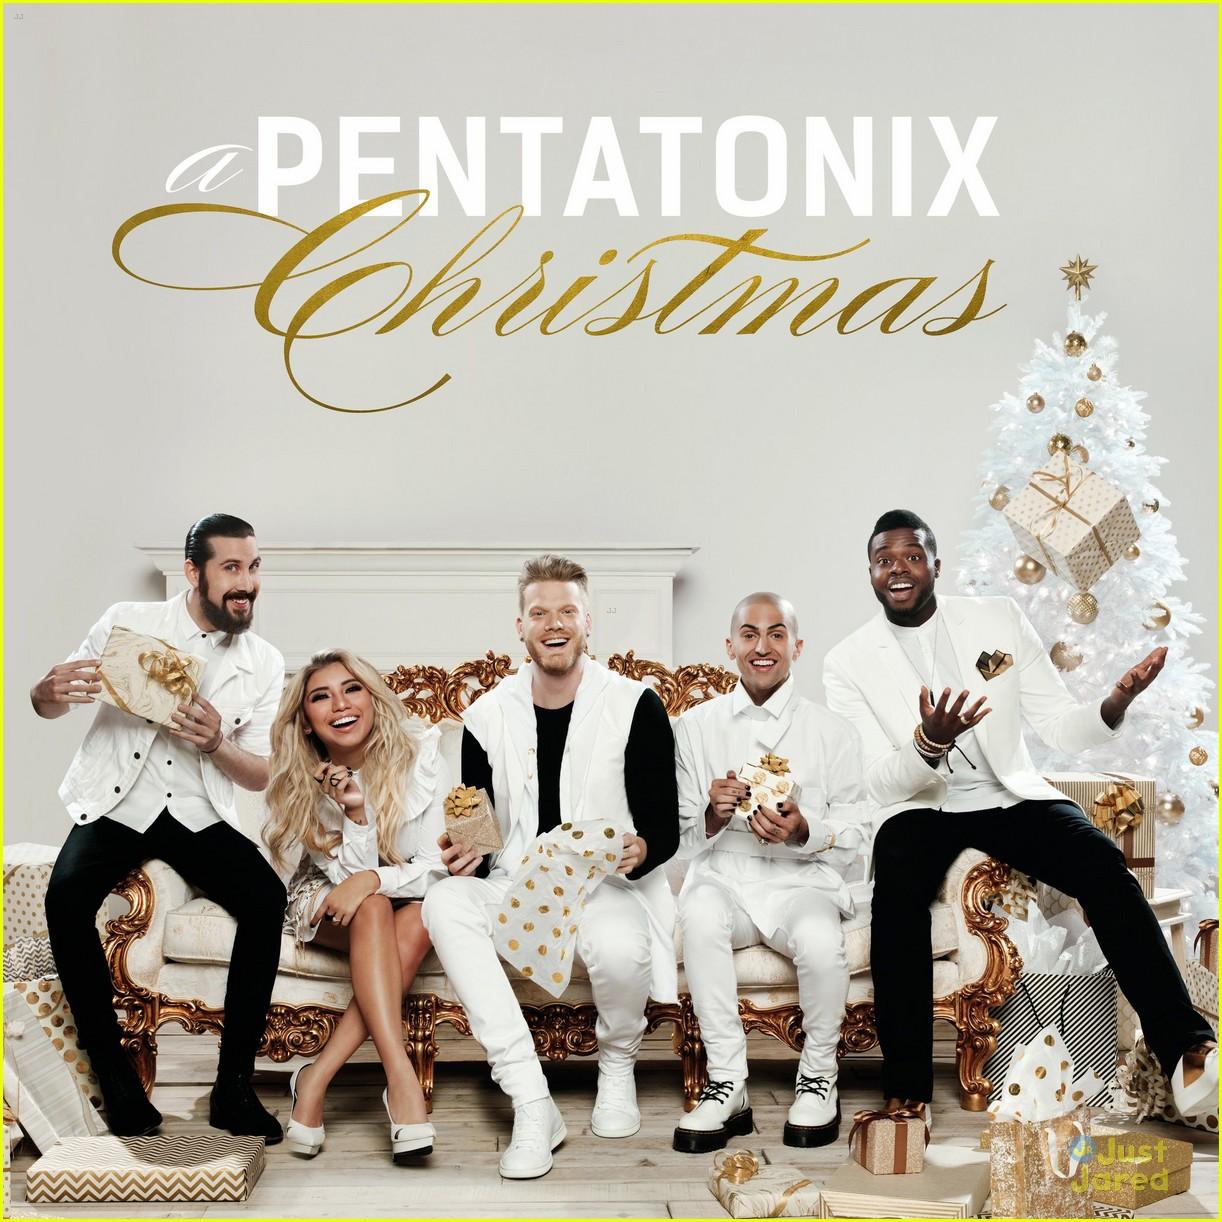 Pentatonix Unveil Artwork & Track Listing For 'Pentatonix Christmas'   Photo 1035882 - Photo ...